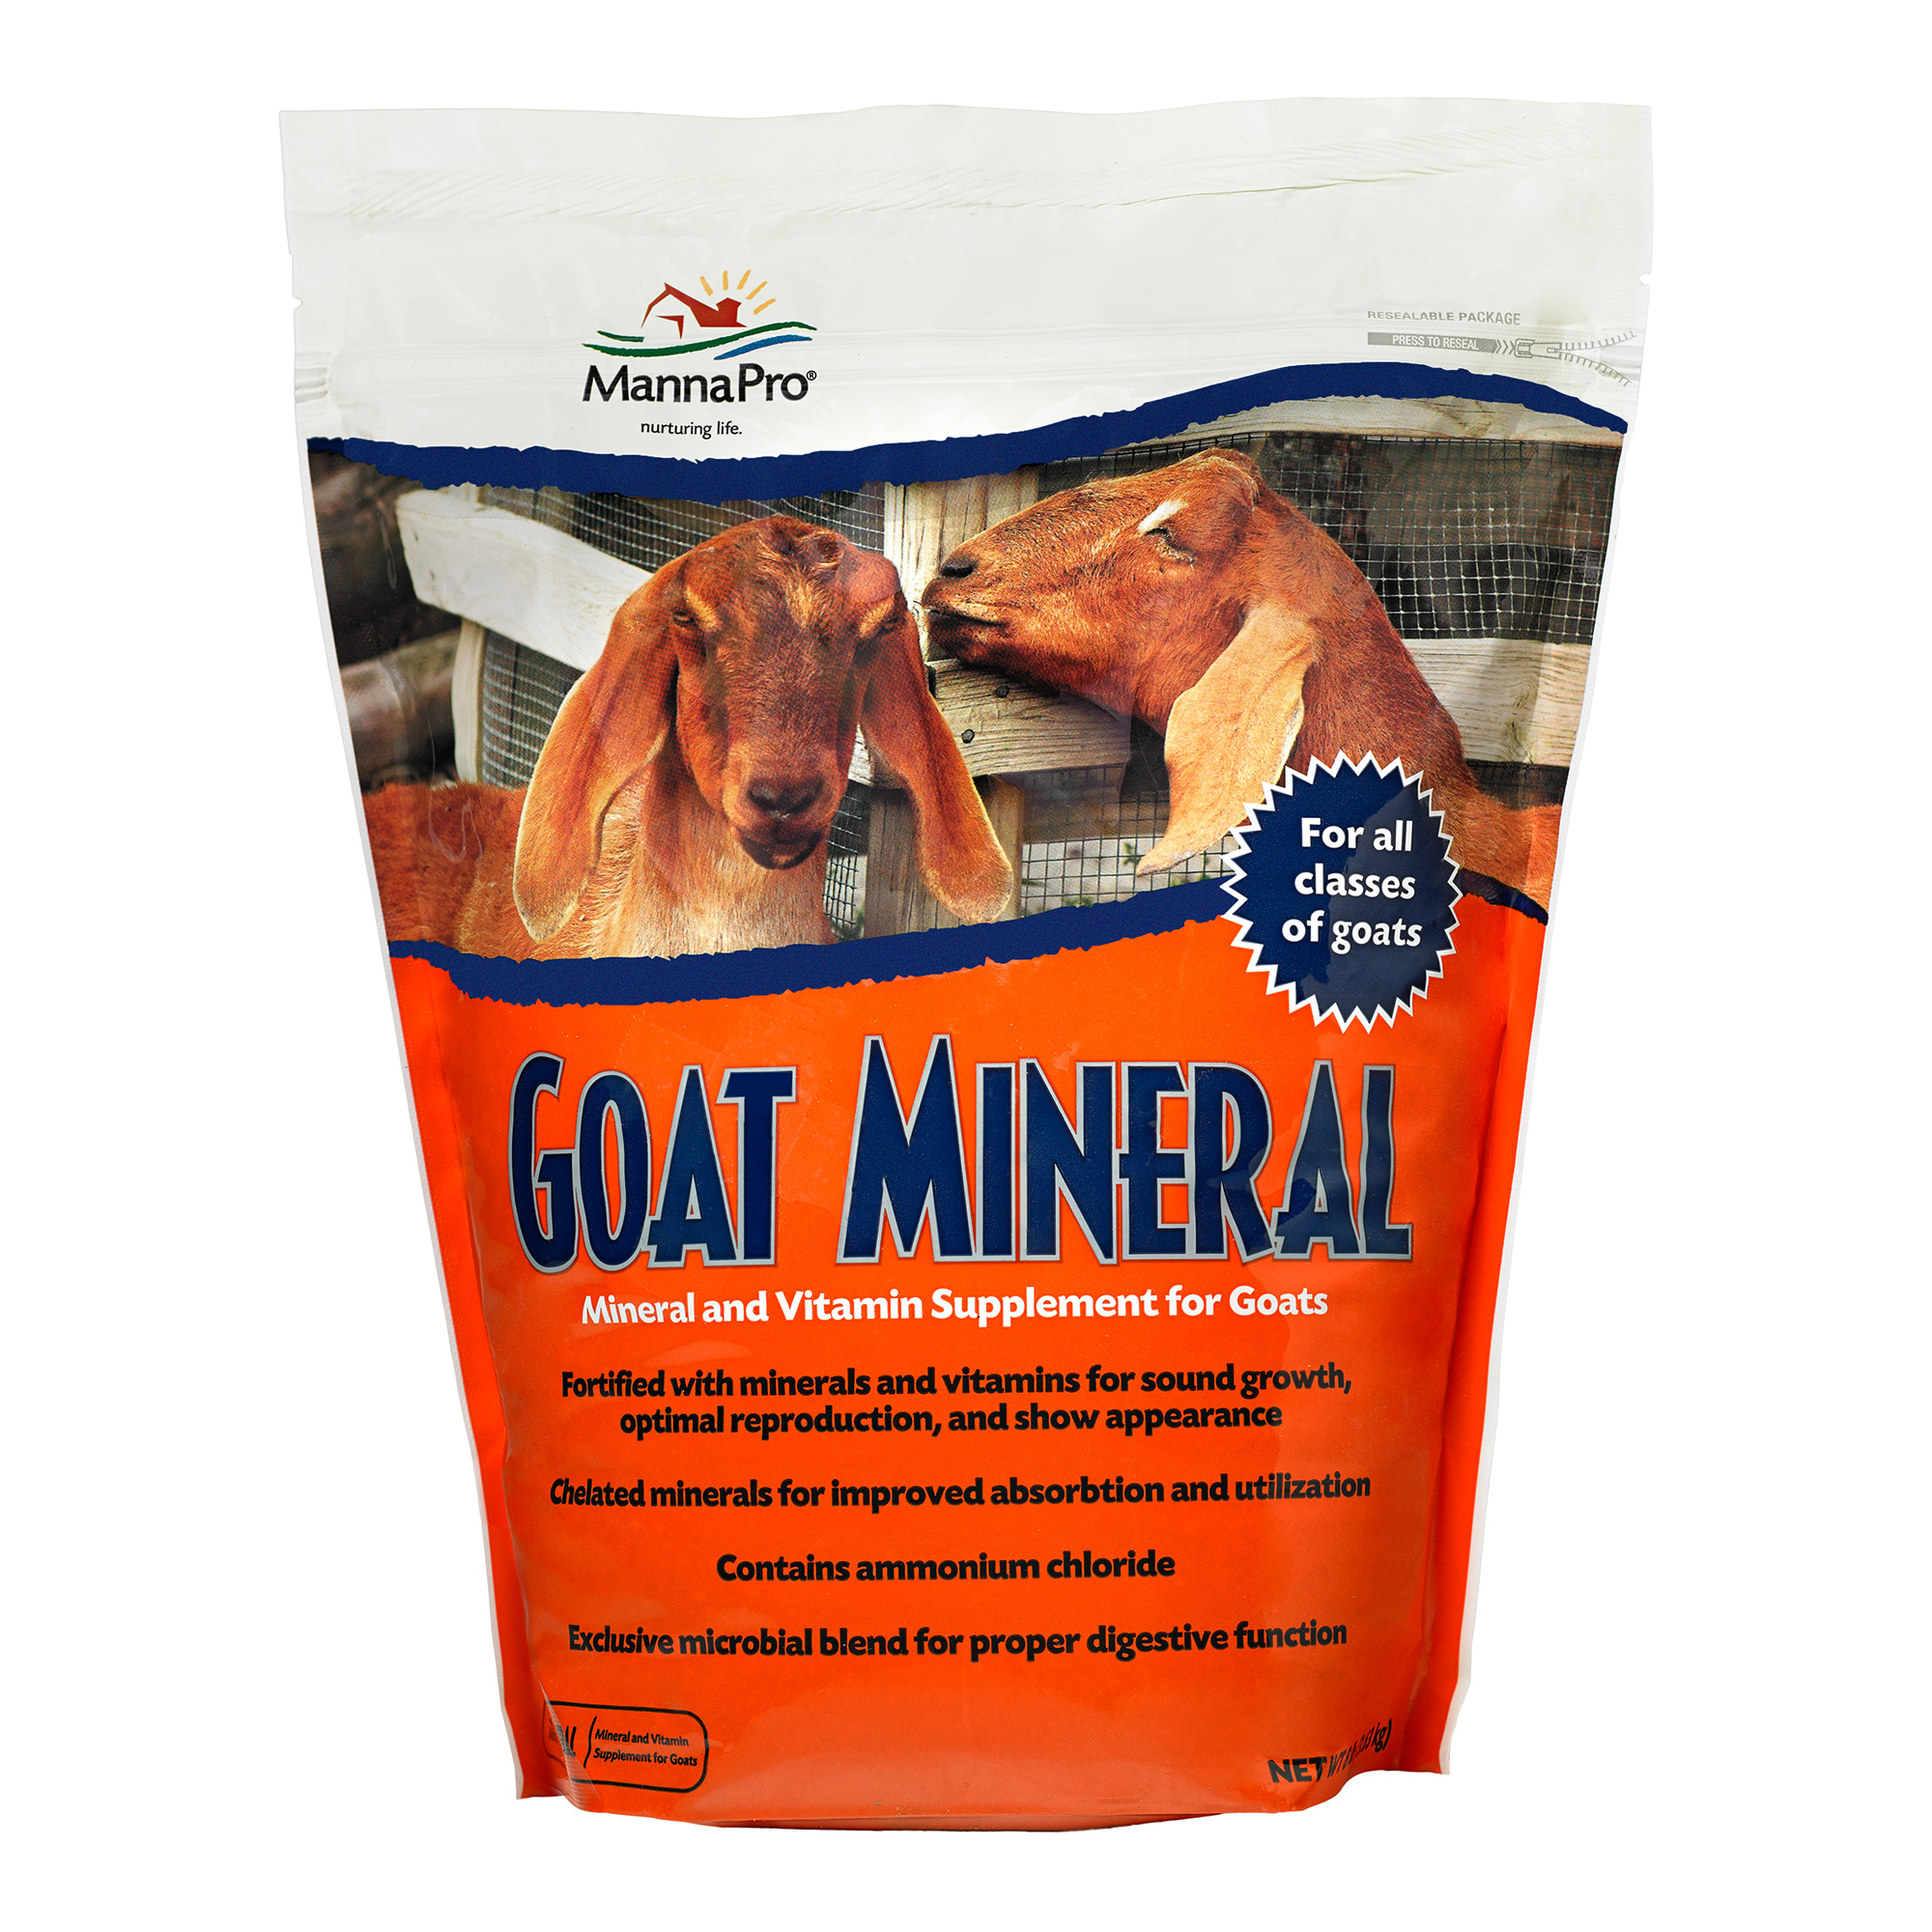 Manna Pro Goat Mineral Supplement for Goats, 8-lb